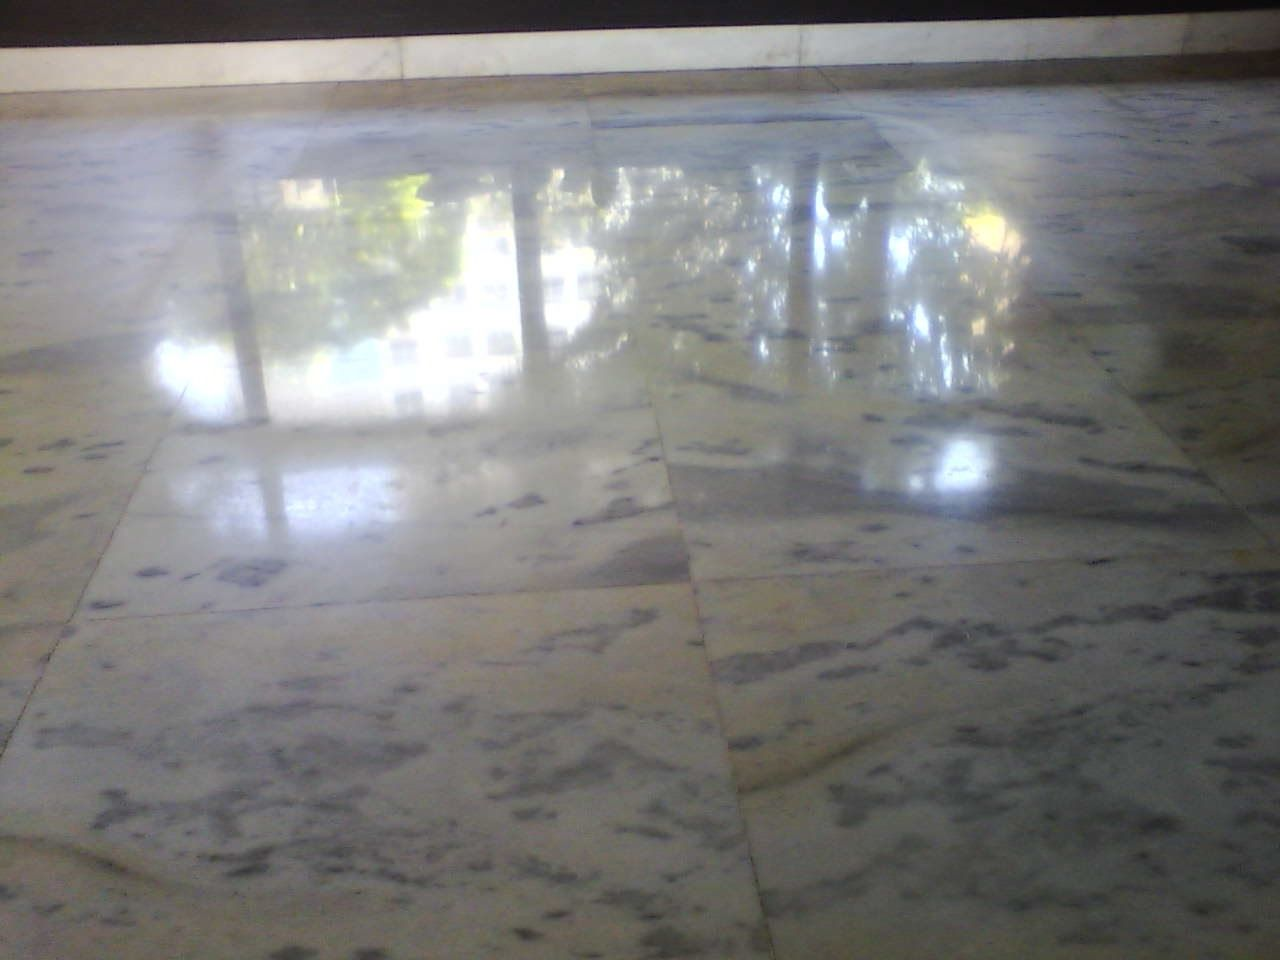 Limpeza de Granito em Sp Preço Alphaville Conde I - Limpeza de Granitos e Mármores